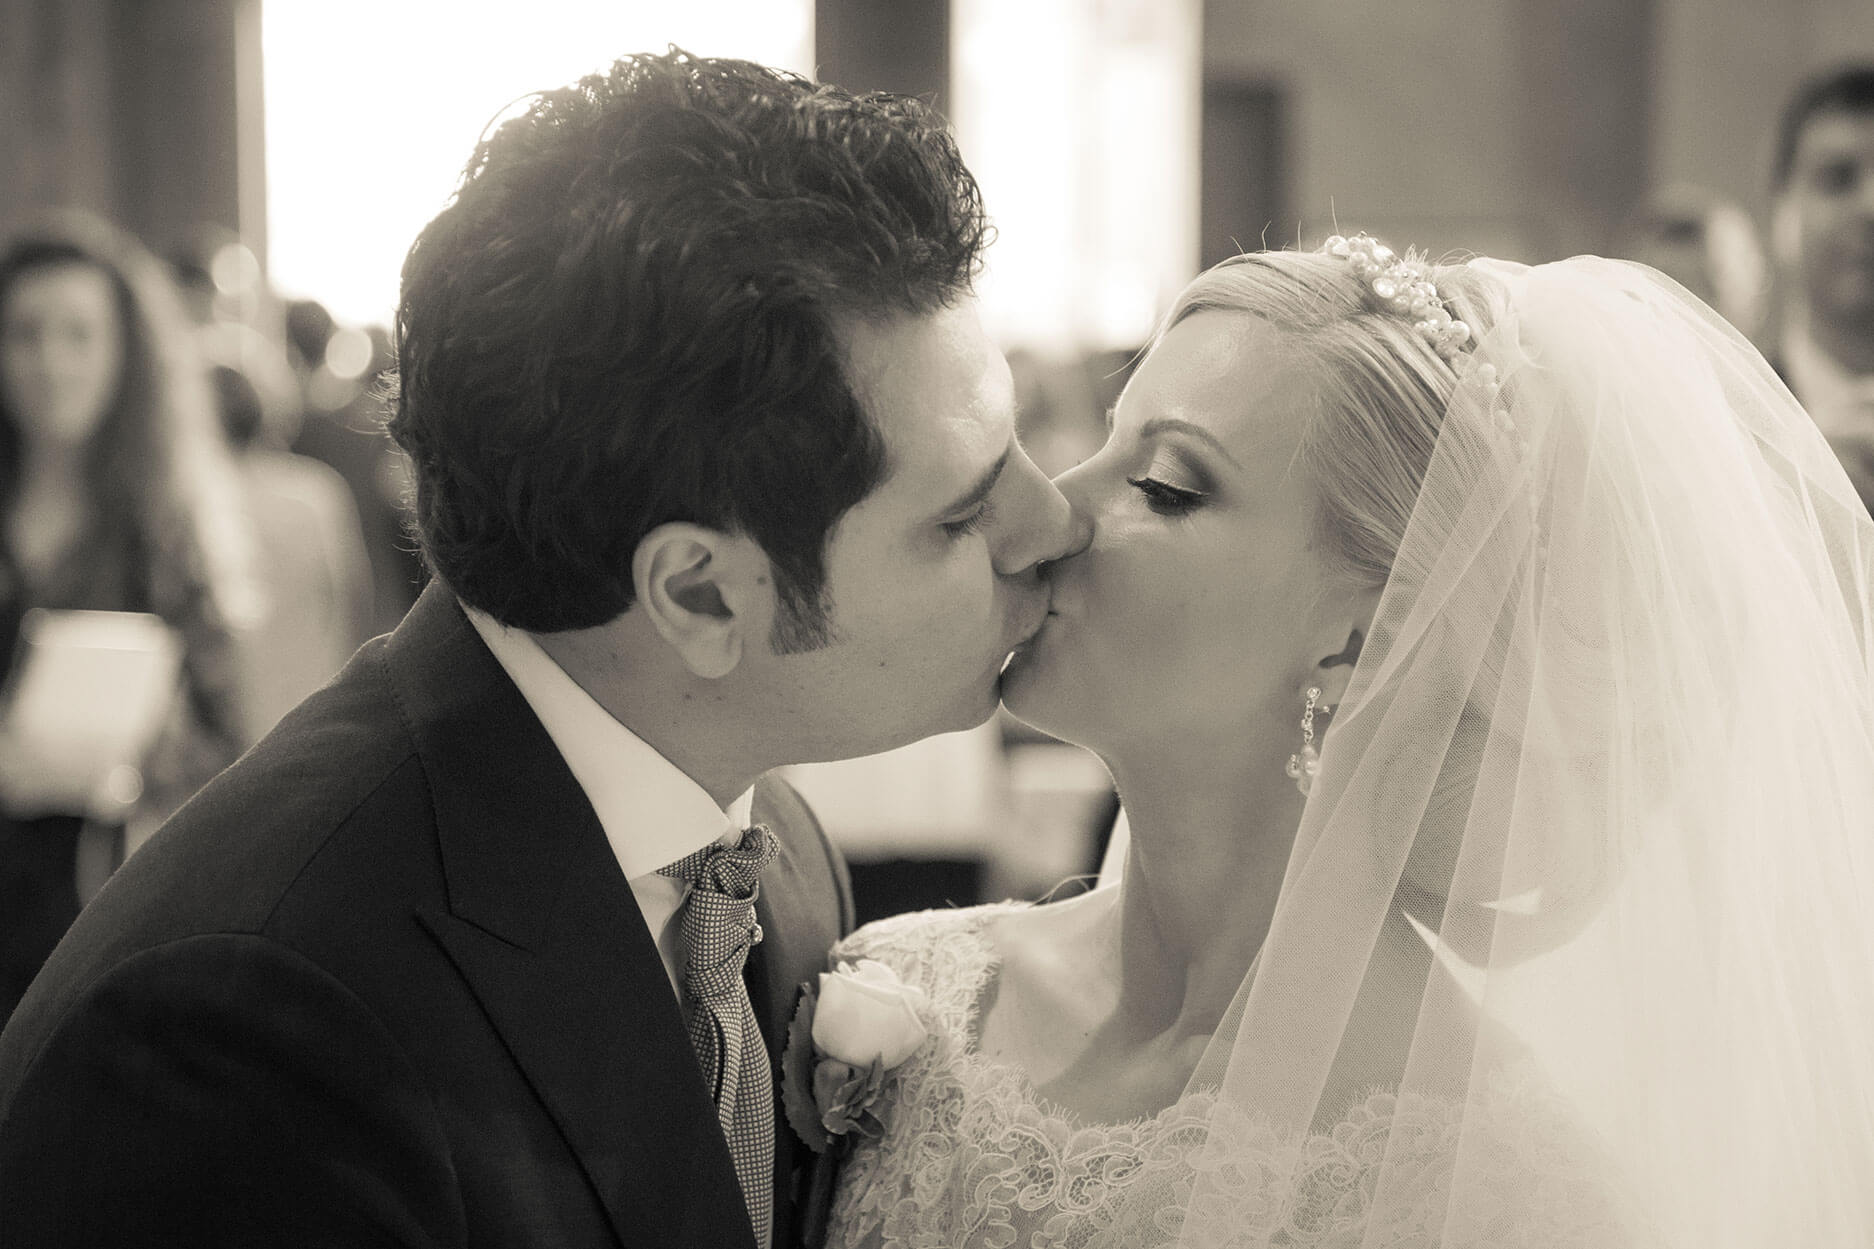 Francesca-Ferrati-wedding-photographer-Verona-Svetlana-Gianluigi20